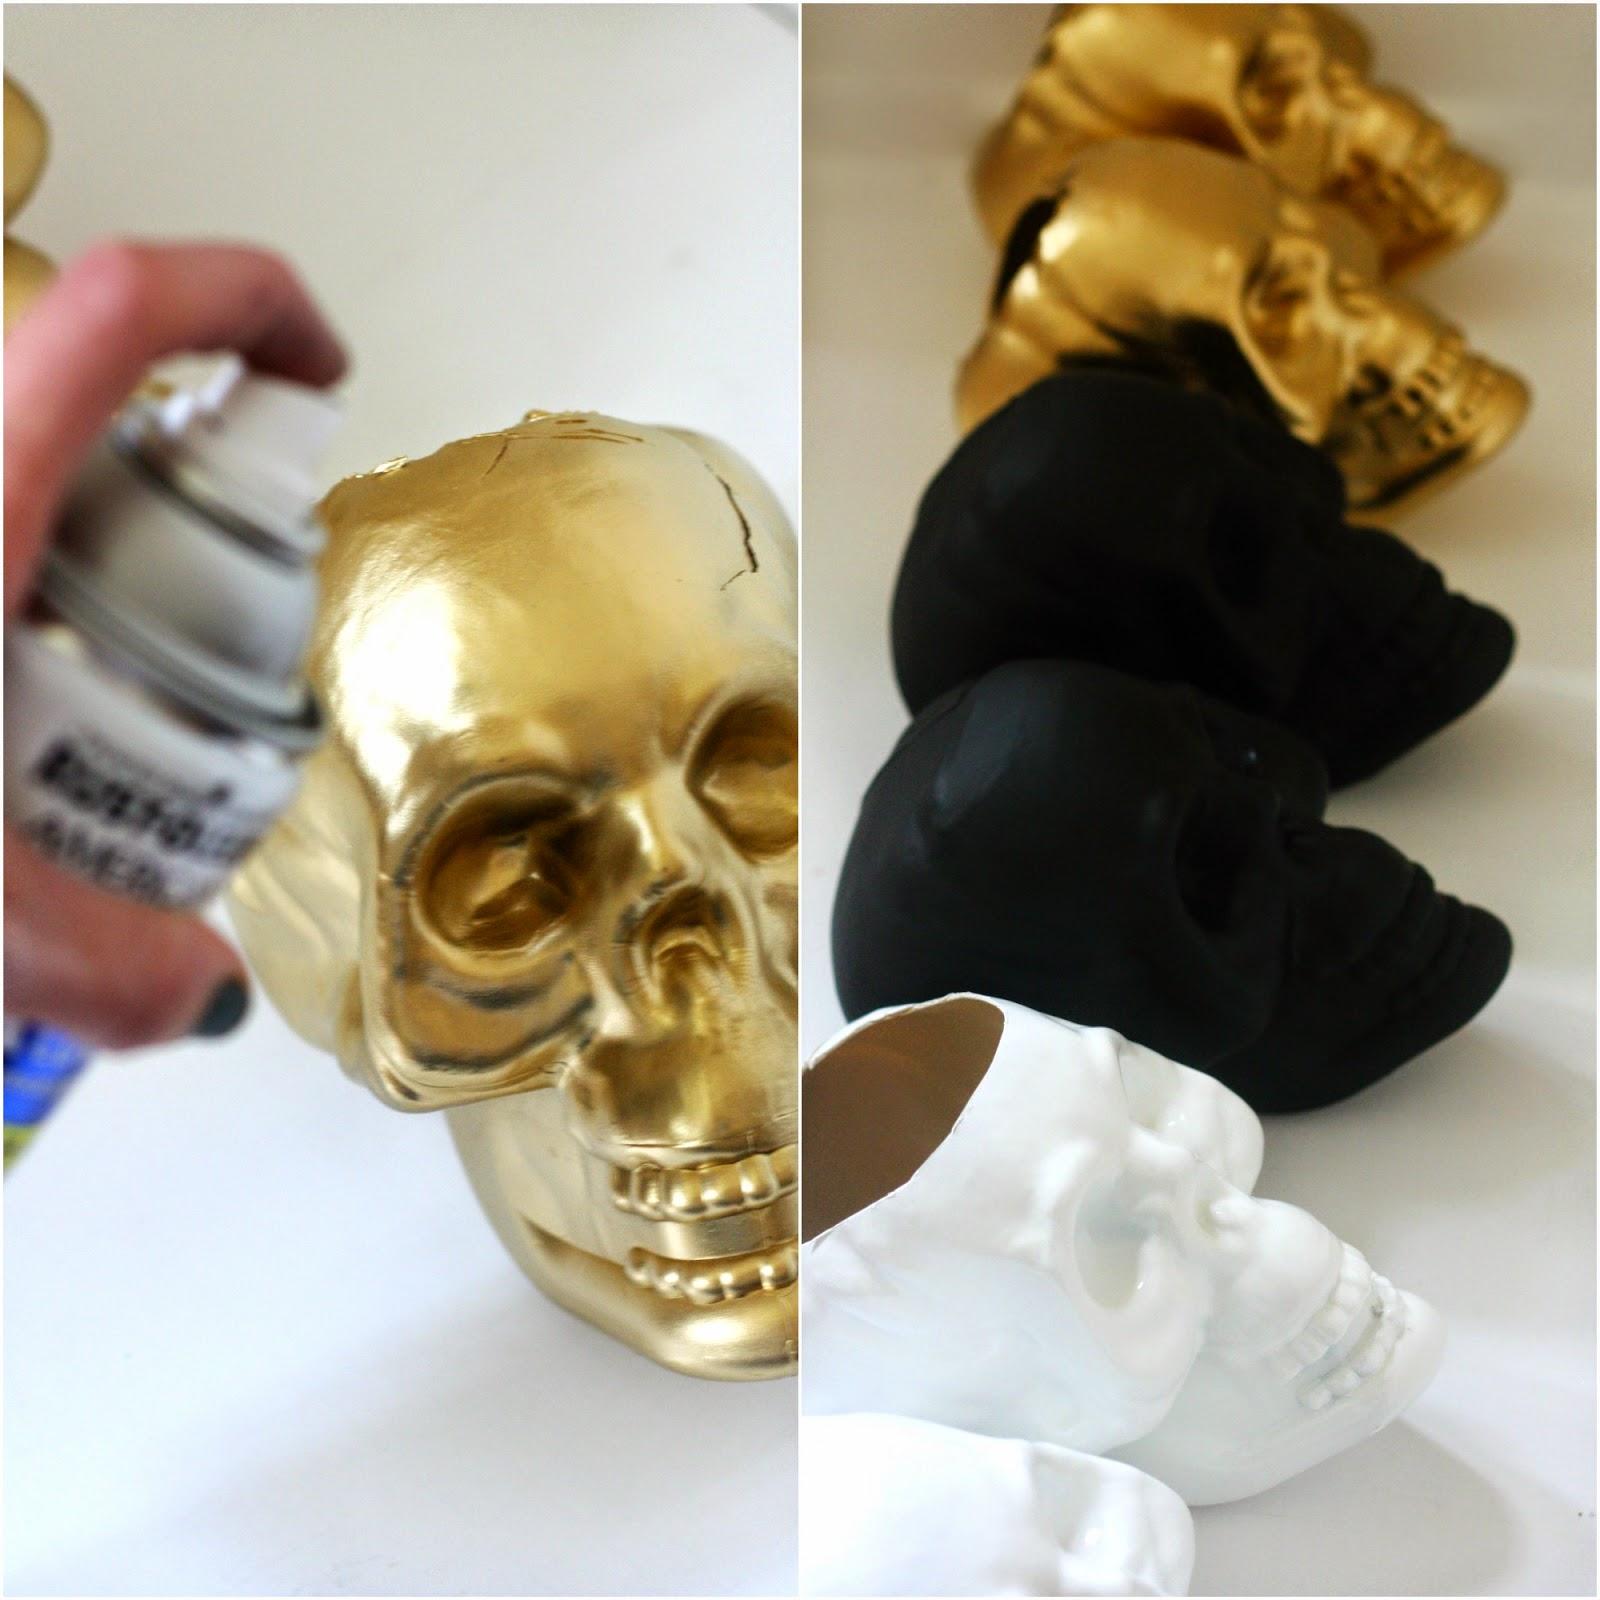 DIY Upcycled Dollar Store Skulls The Pretty Life Girls